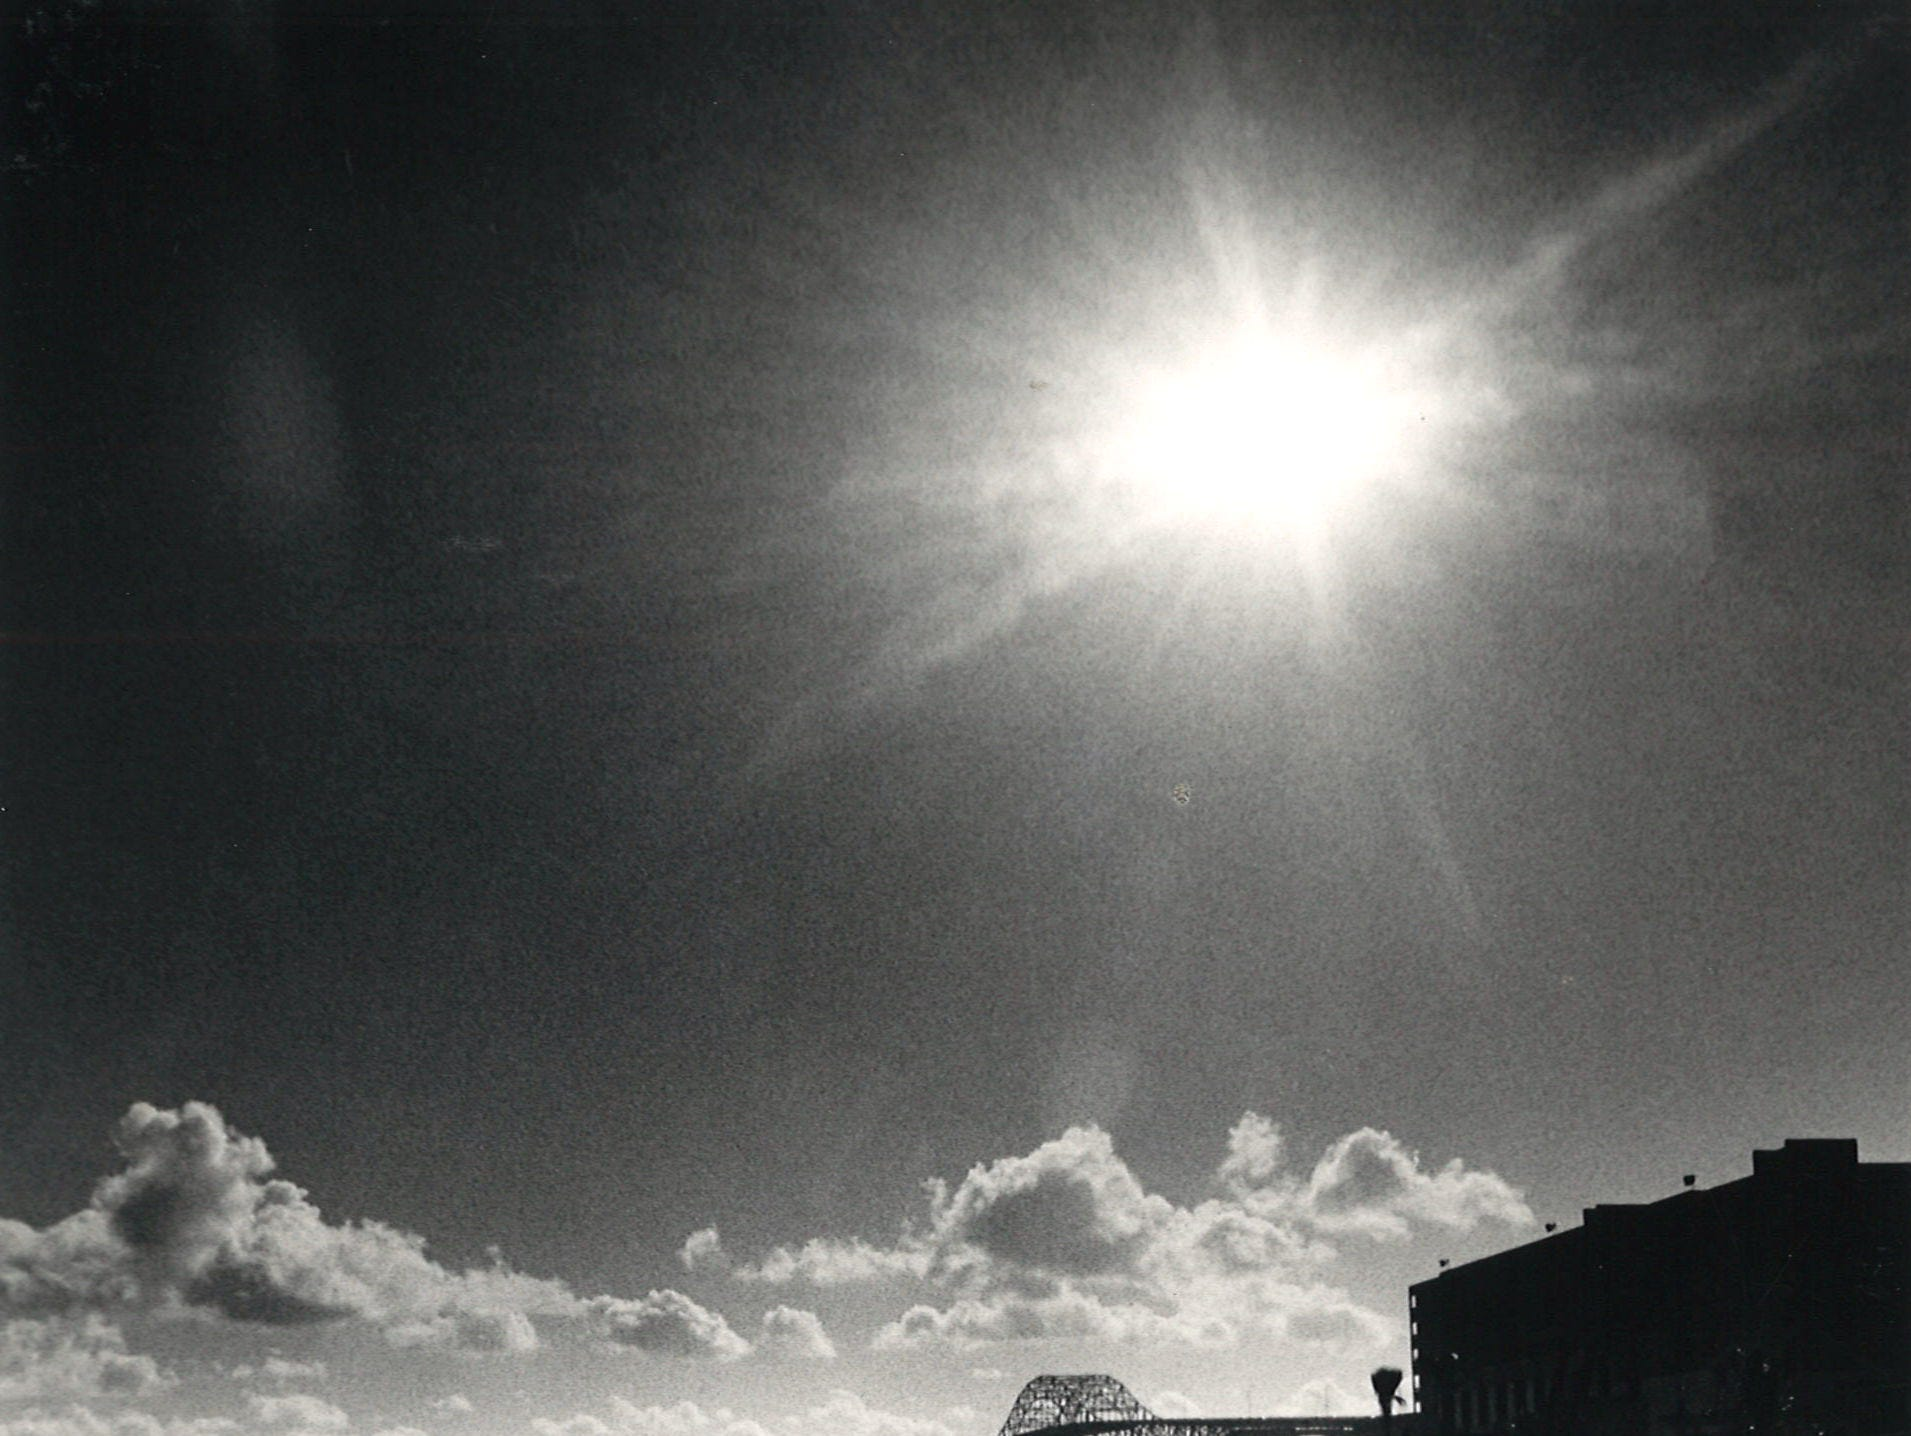 Fredi Schilling of Switzerland kicks back and enjoys the warm sun on Corpus Christi's North Beach on Nov. 10, 1986.